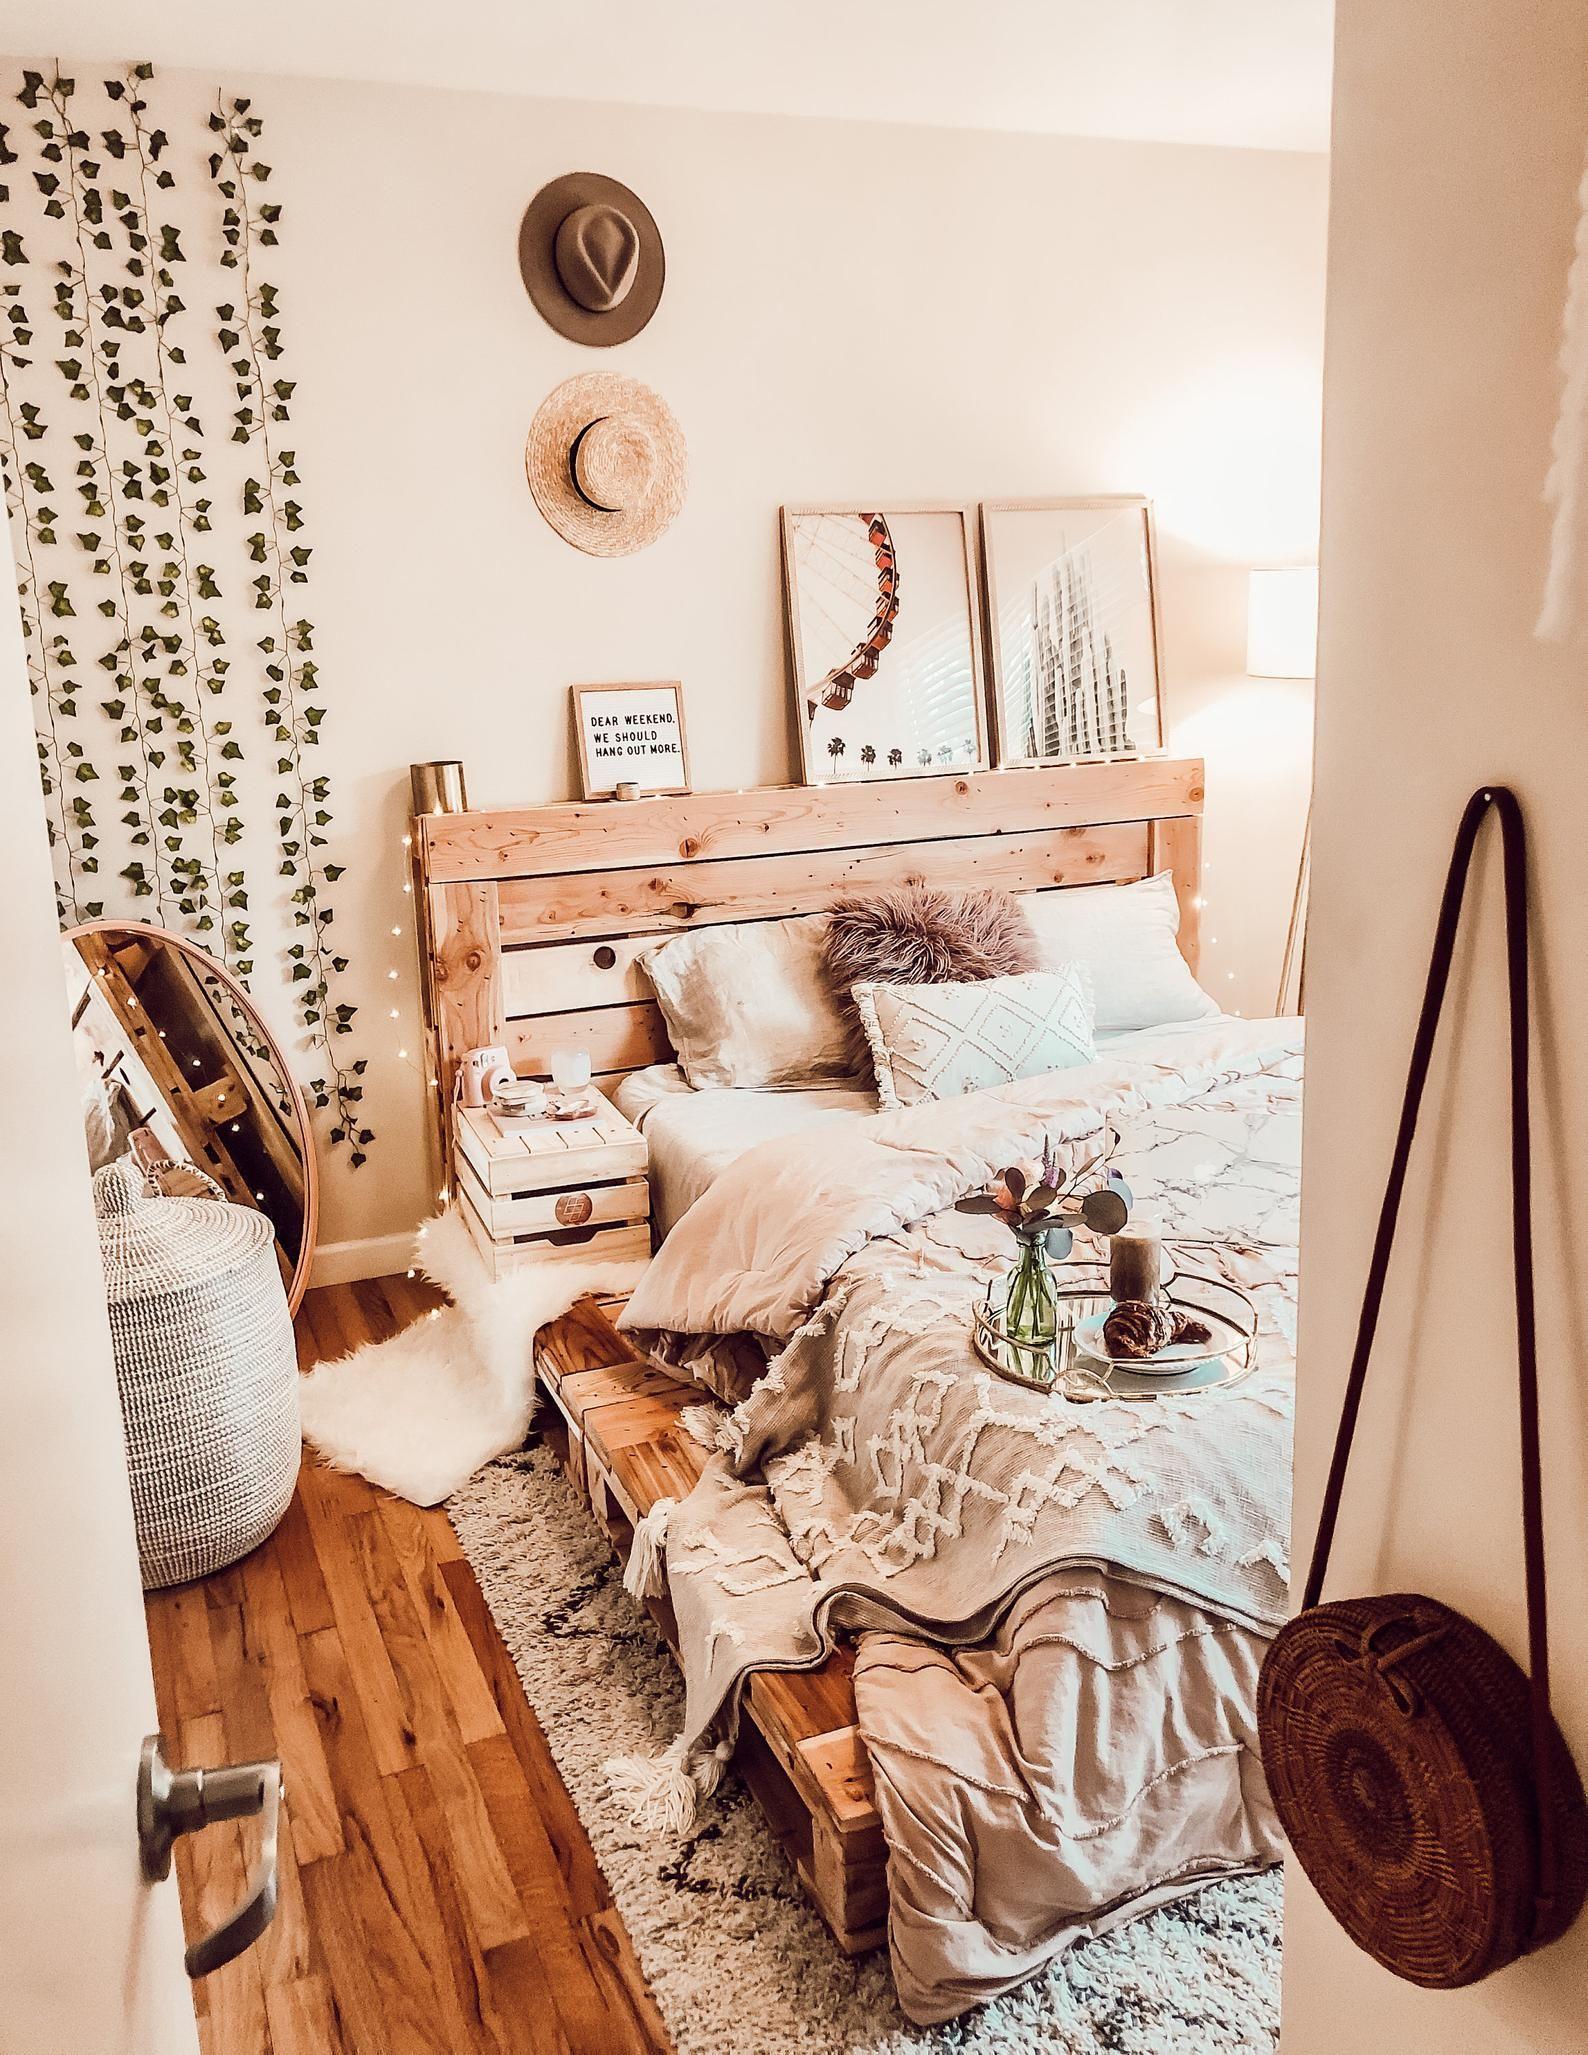 Pallet Platform Bed -queen in 2019 | Boho bedroom decor ... on Pallet Bed Room  id=44846